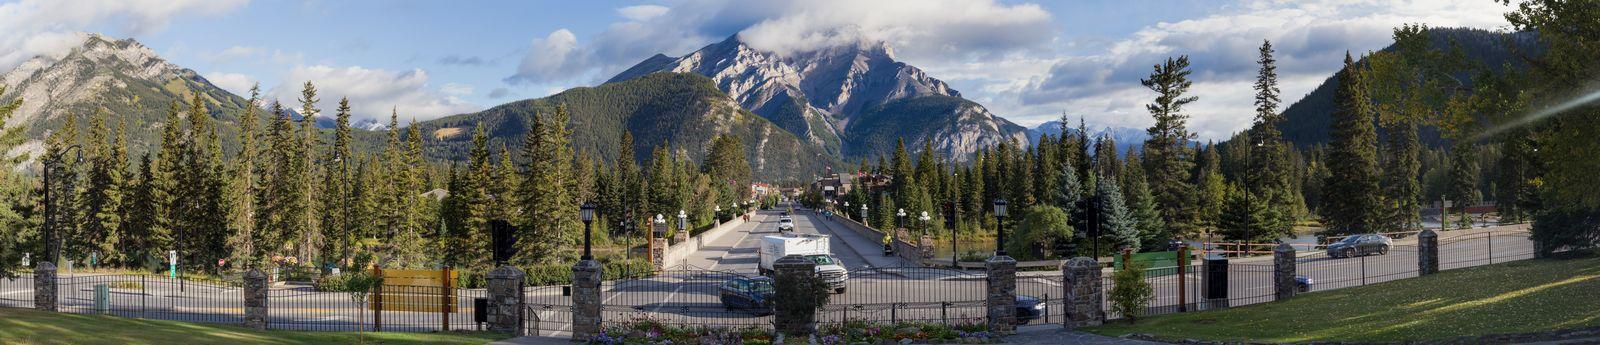 Banff Avenue y Cascade Mountain